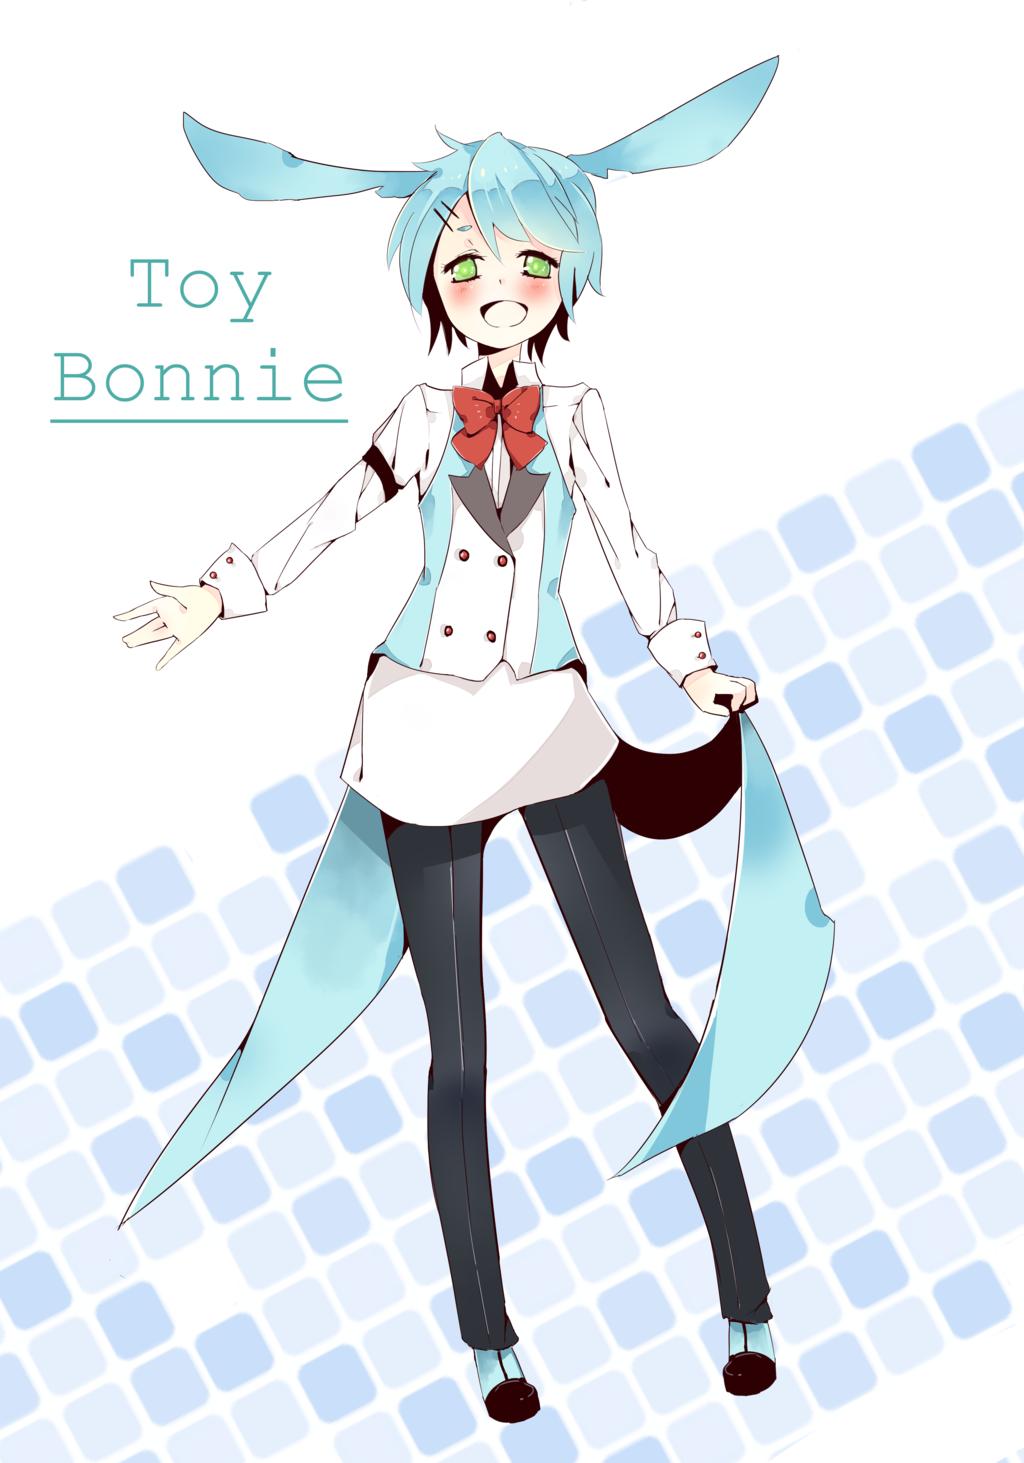 Five Nights At Anime Game Porn toy bonnie humanmiesakie | anime fnaf, fnaf, fnaf characters